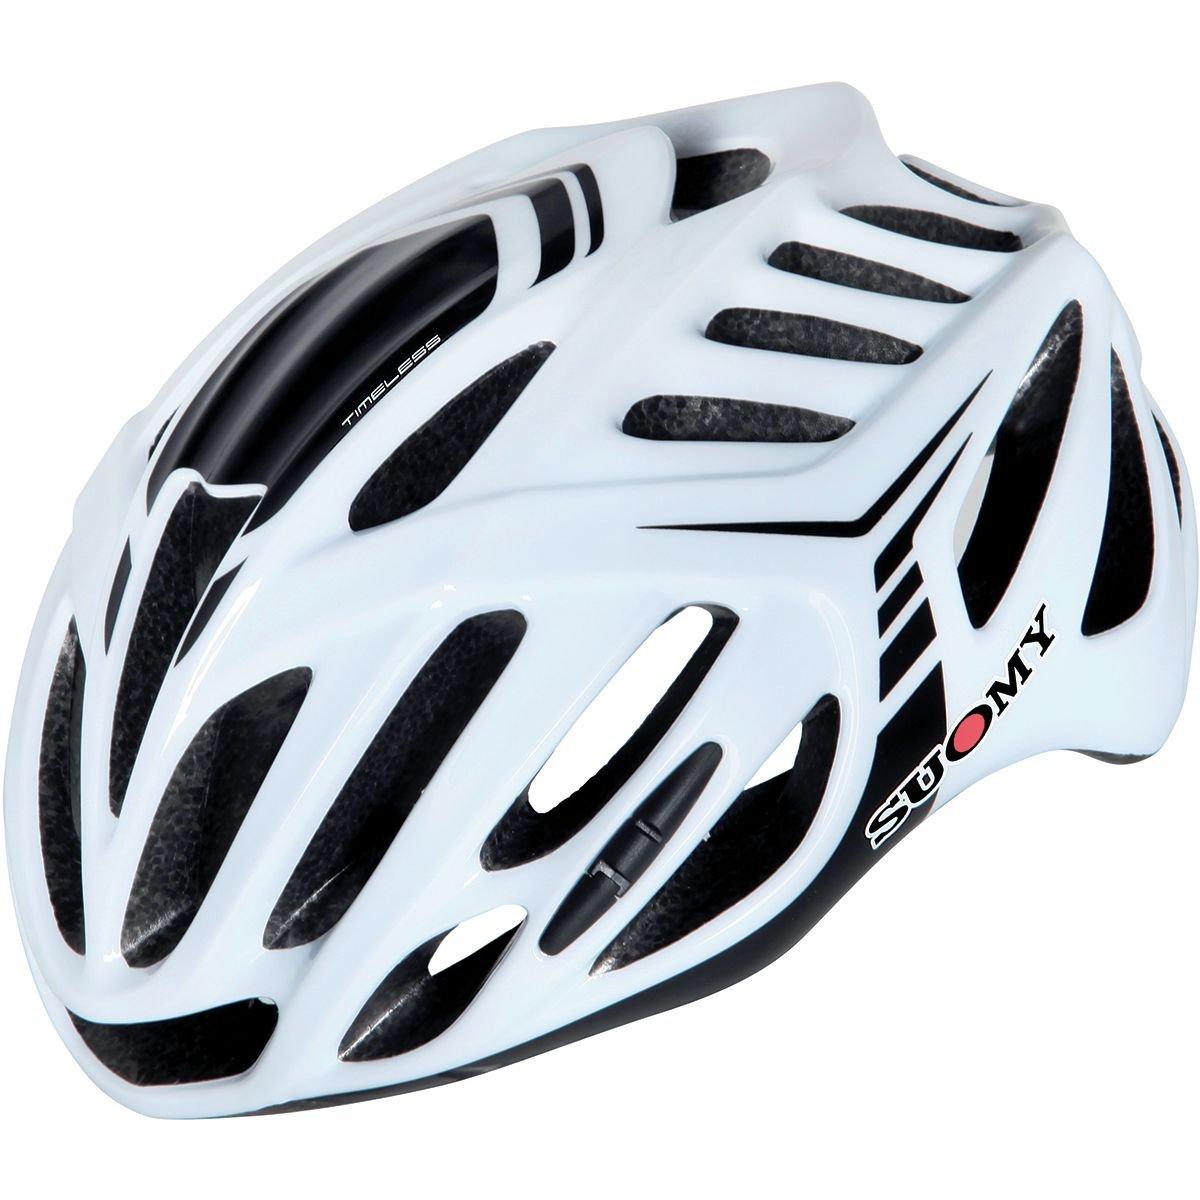 Suomy Timeless Helmet White/Black, L/XL by Suomy